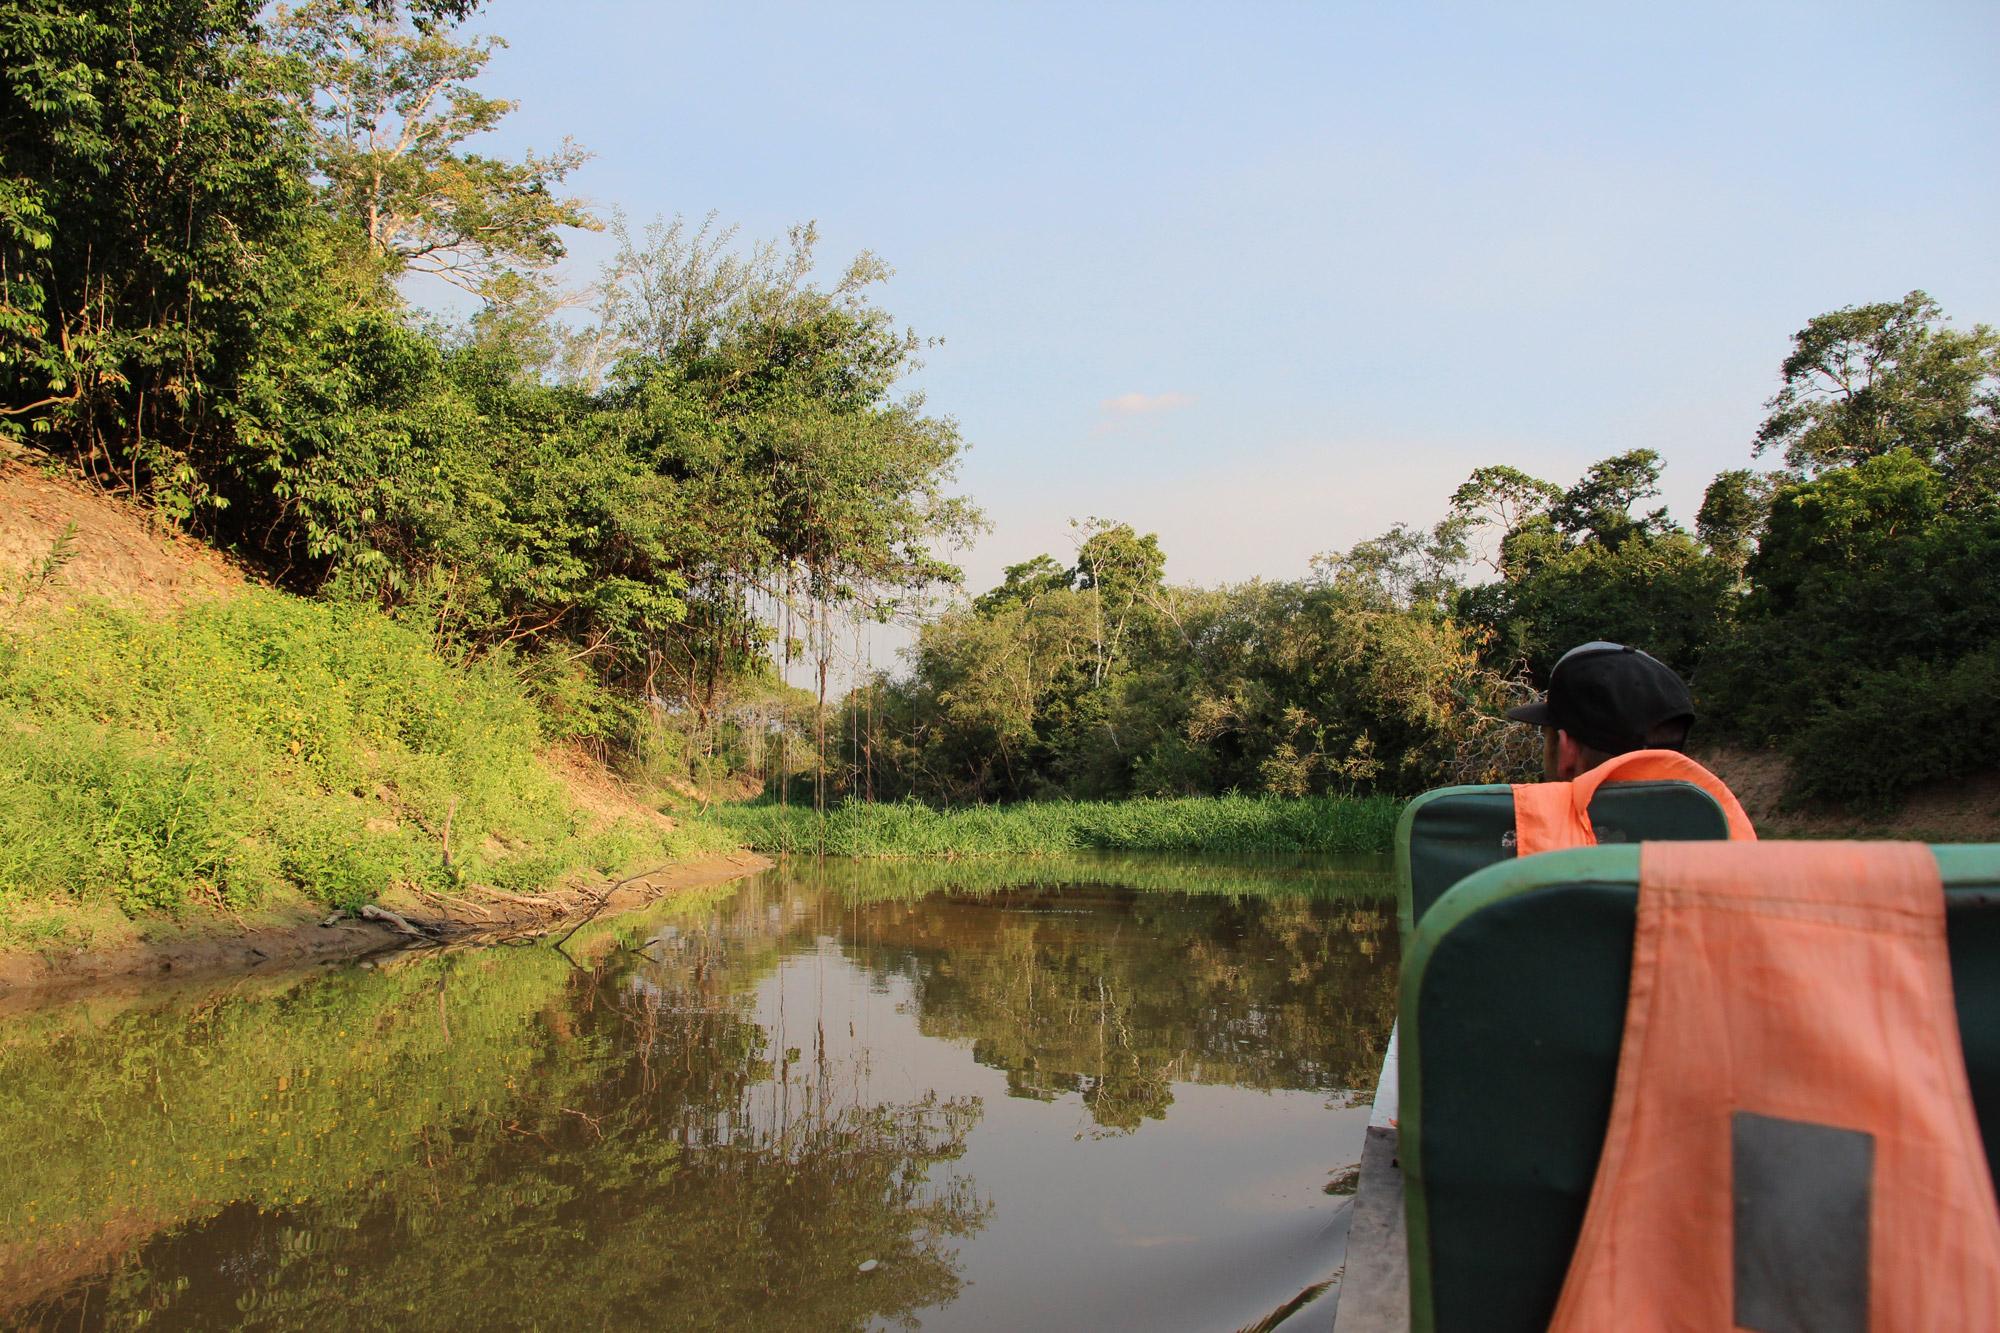 Beste plekken in Bolivia om wildlife te spotten: Pampas